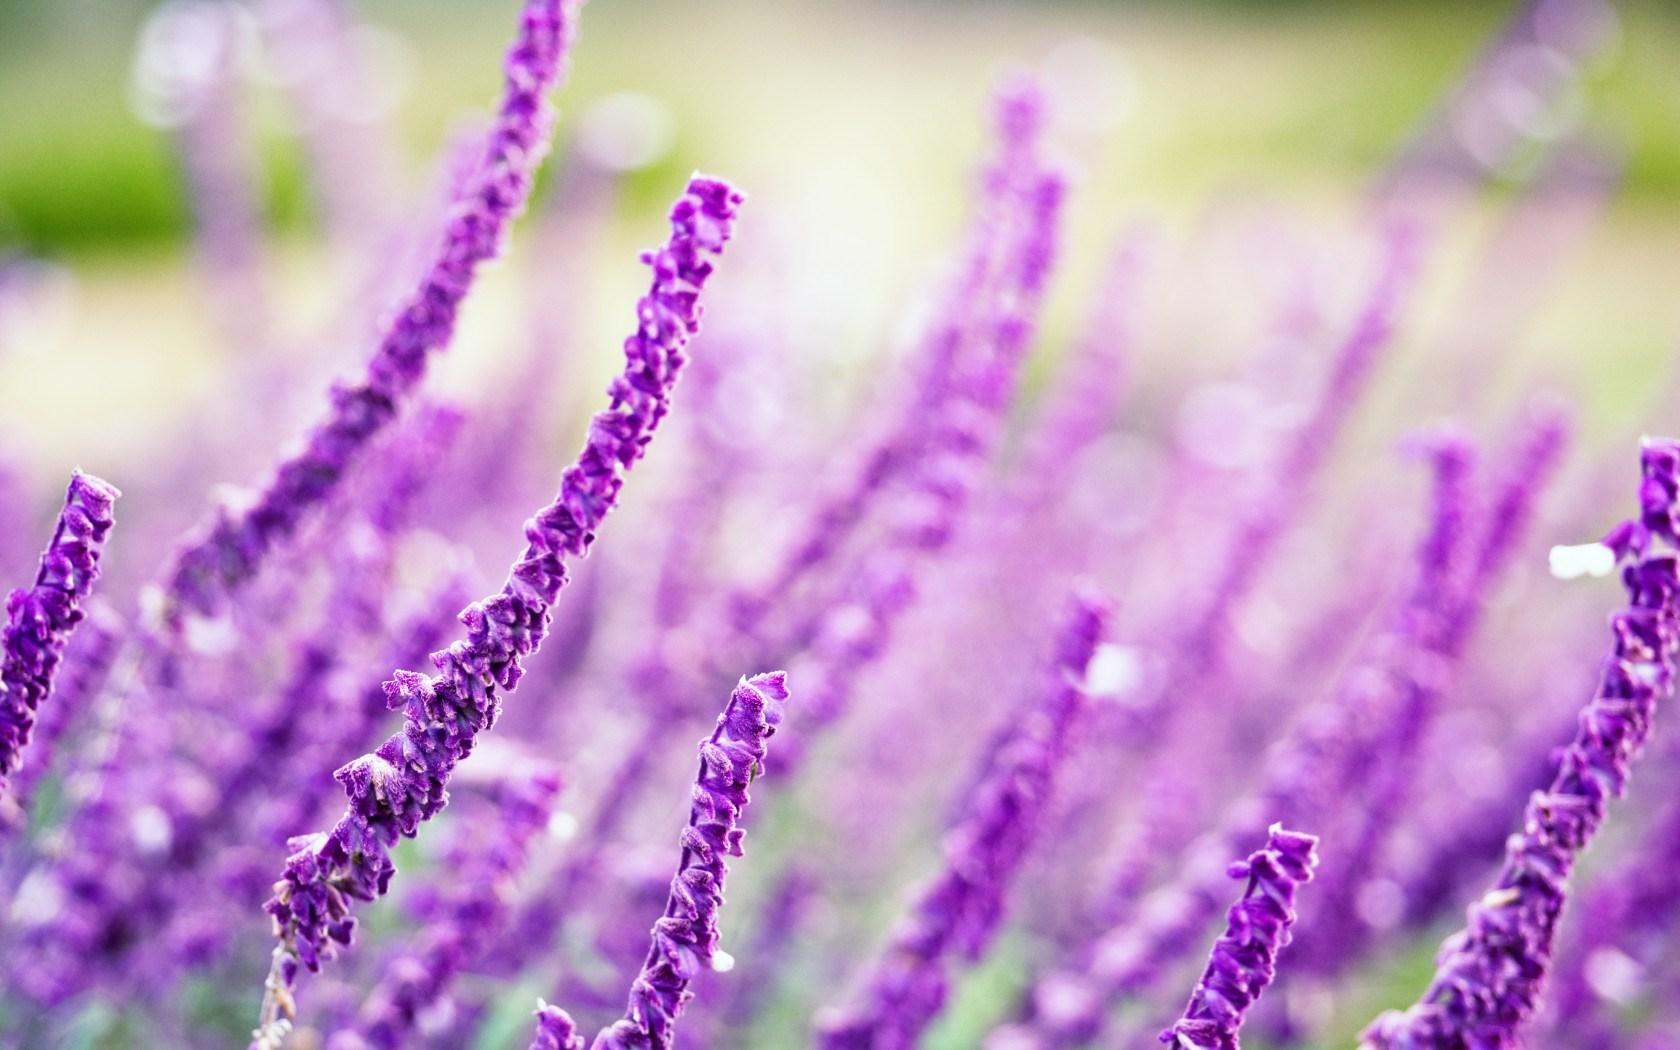 Field Flowers Purple Nature Macro